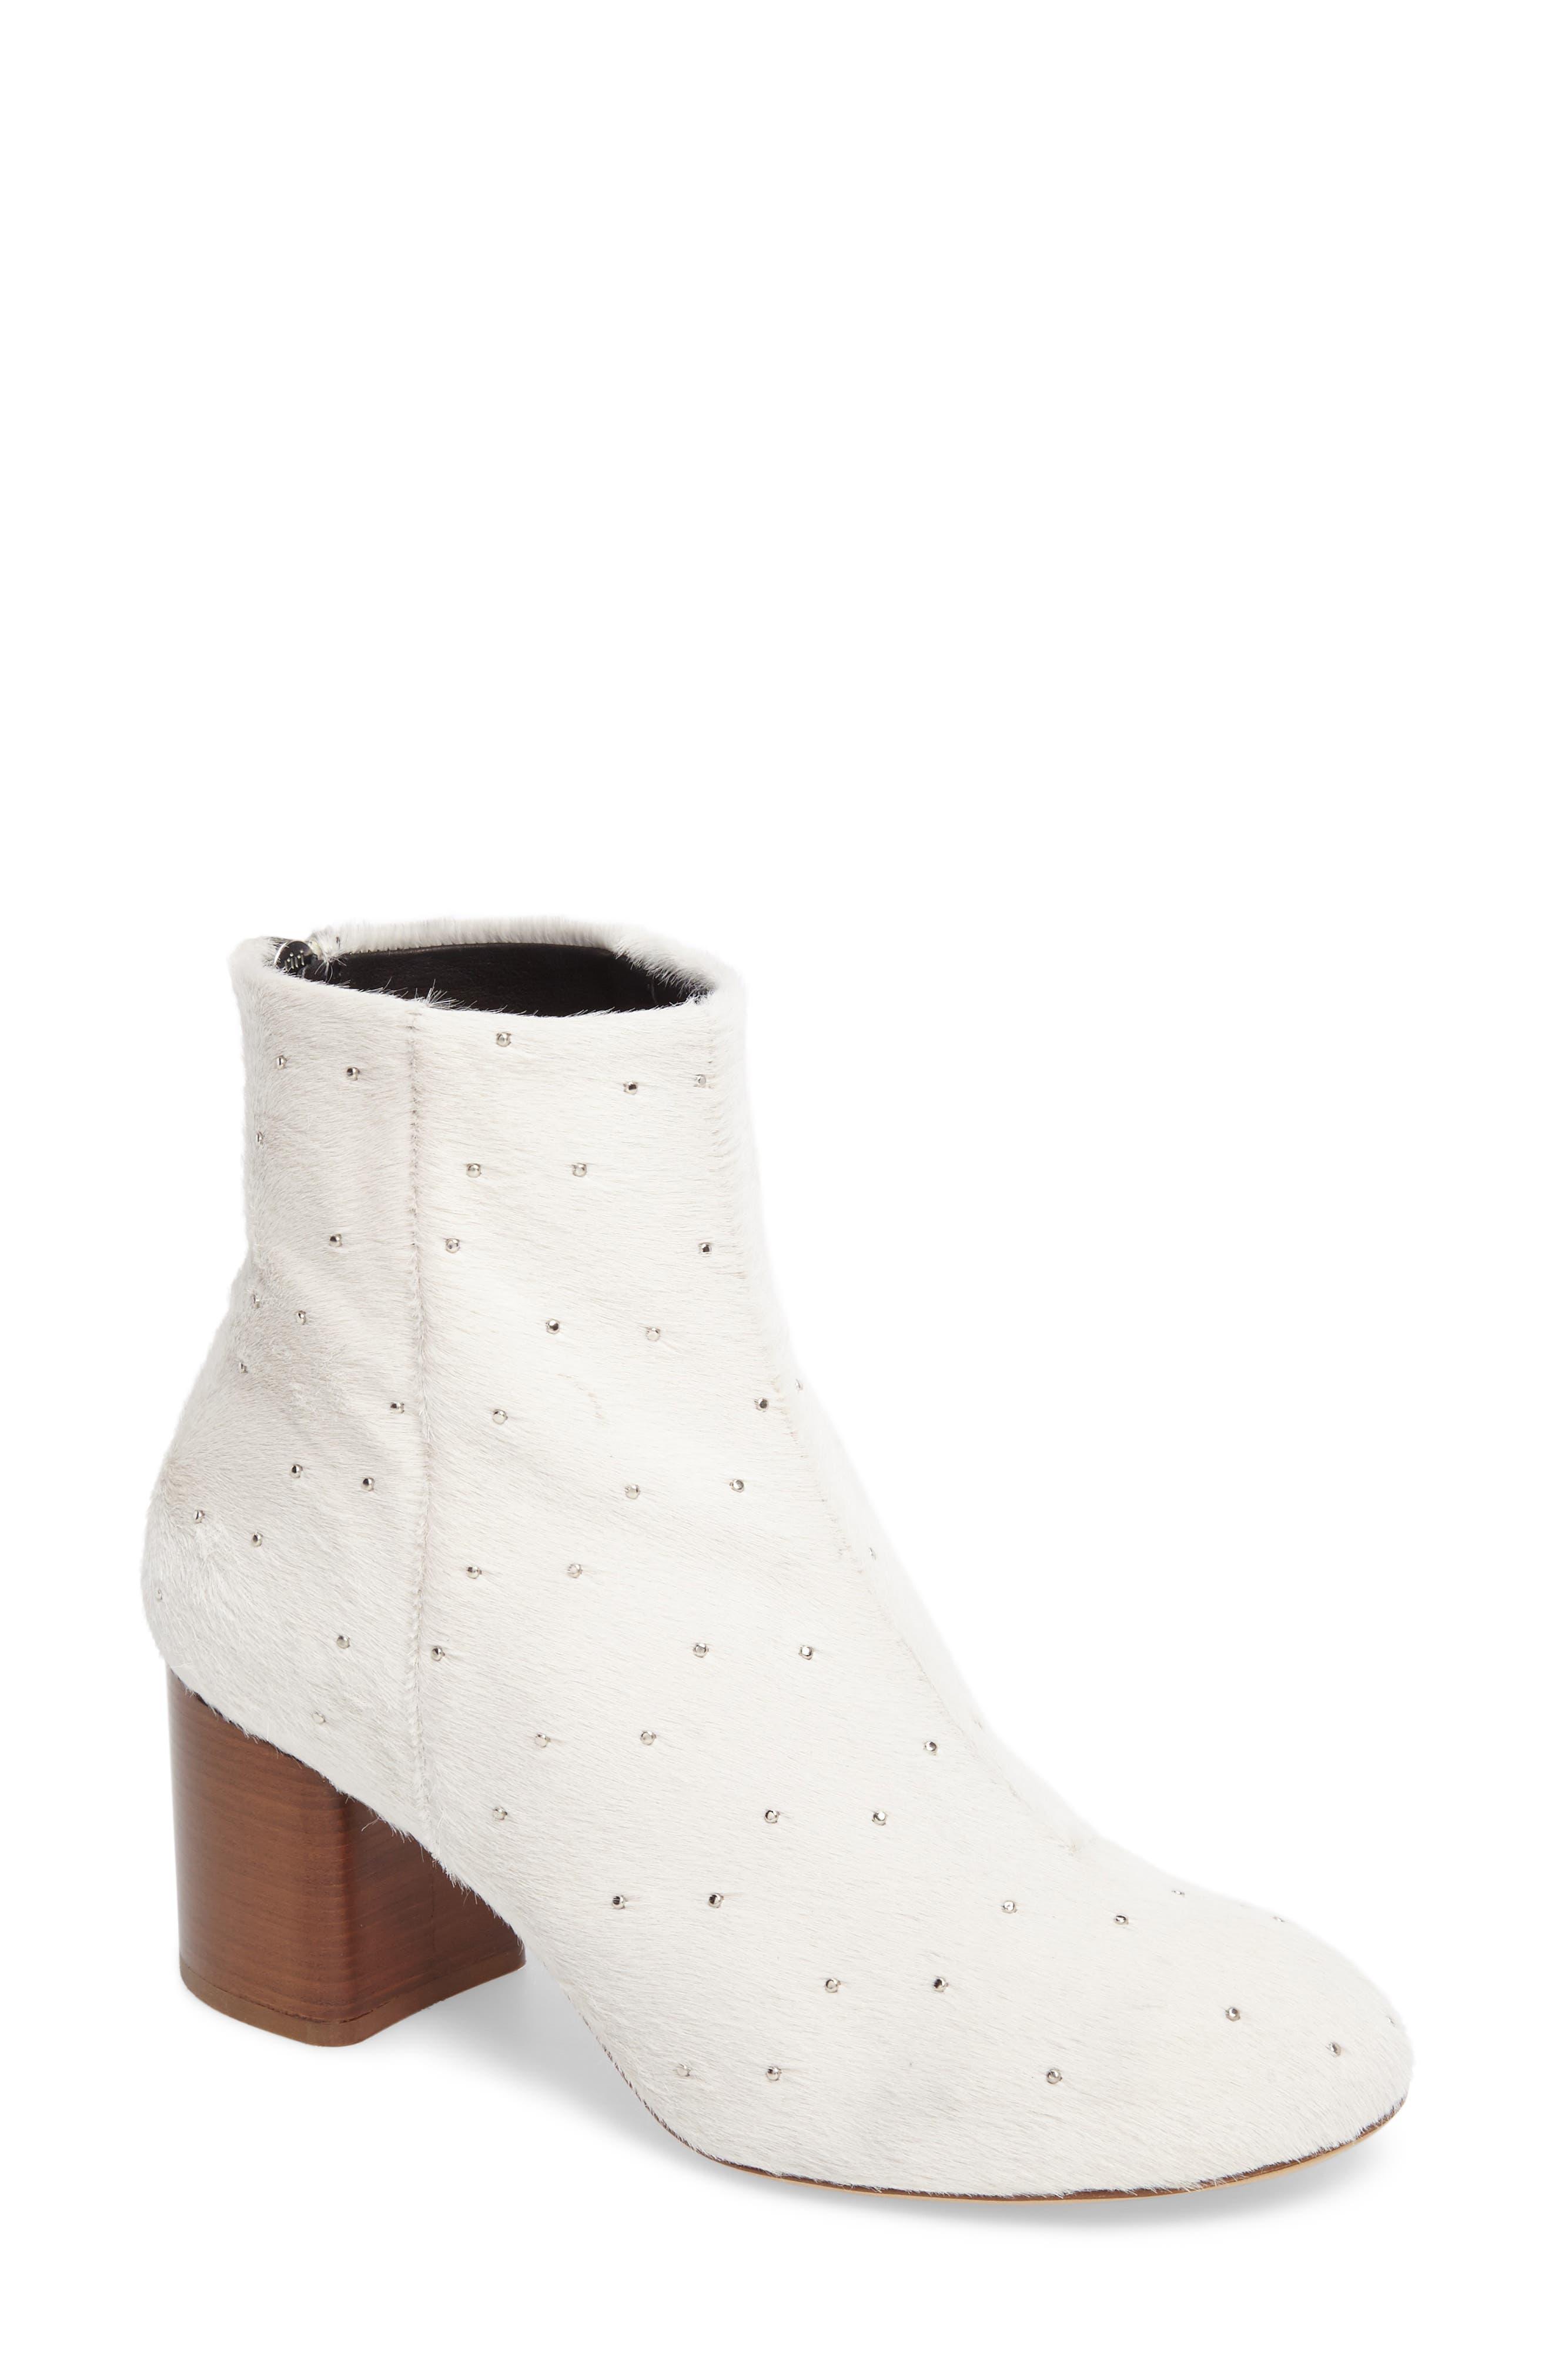 Main Image - rag & bone Drea Genuine Calf Hair Block Heel Bootie (Women)